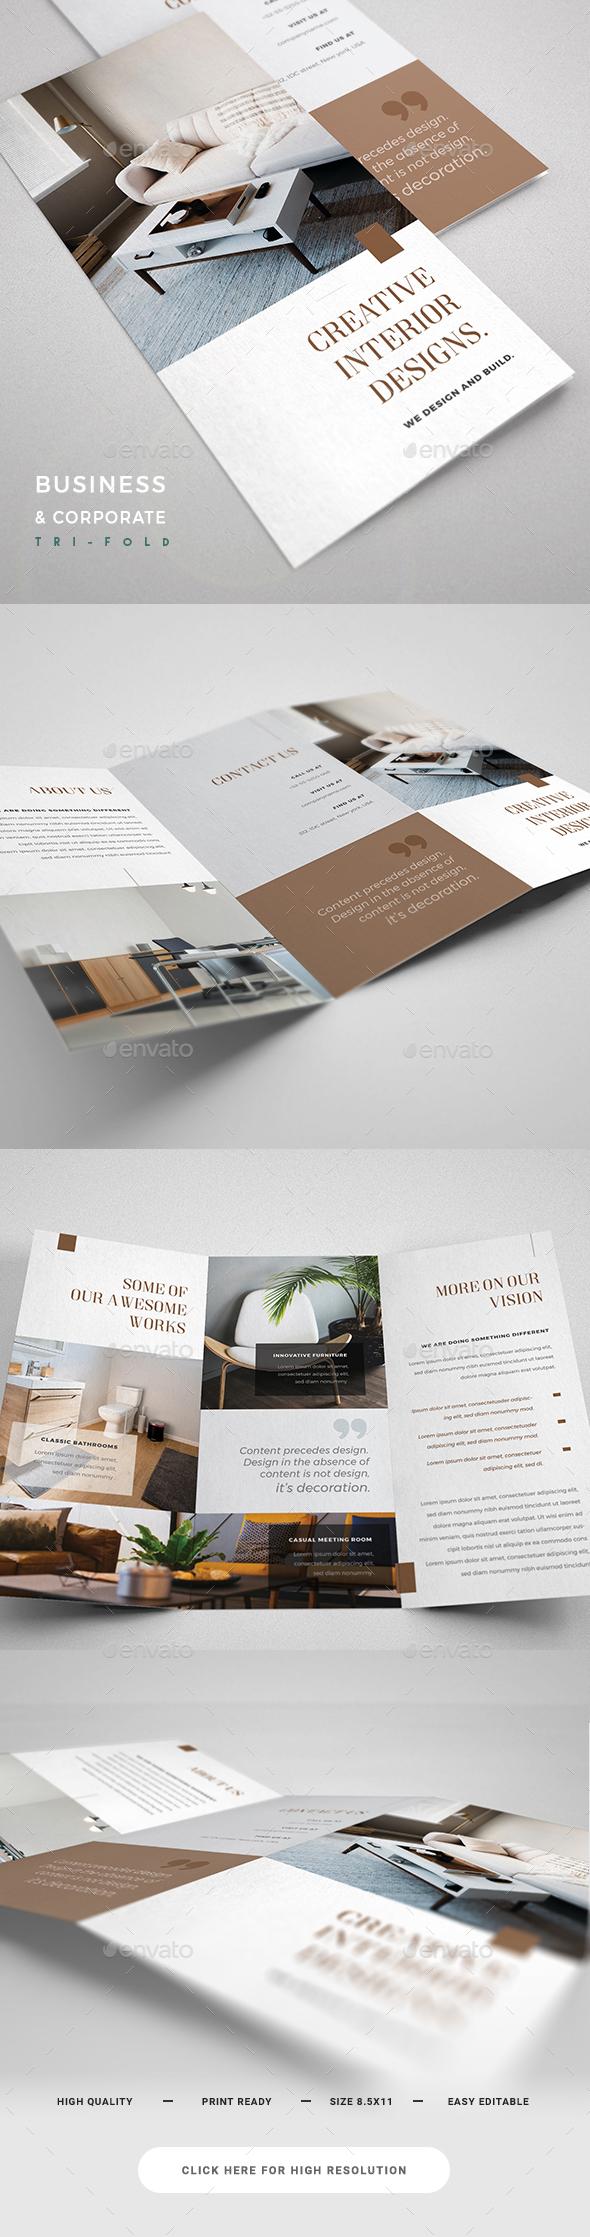 Interior Design Trifold - Corporate Brochures